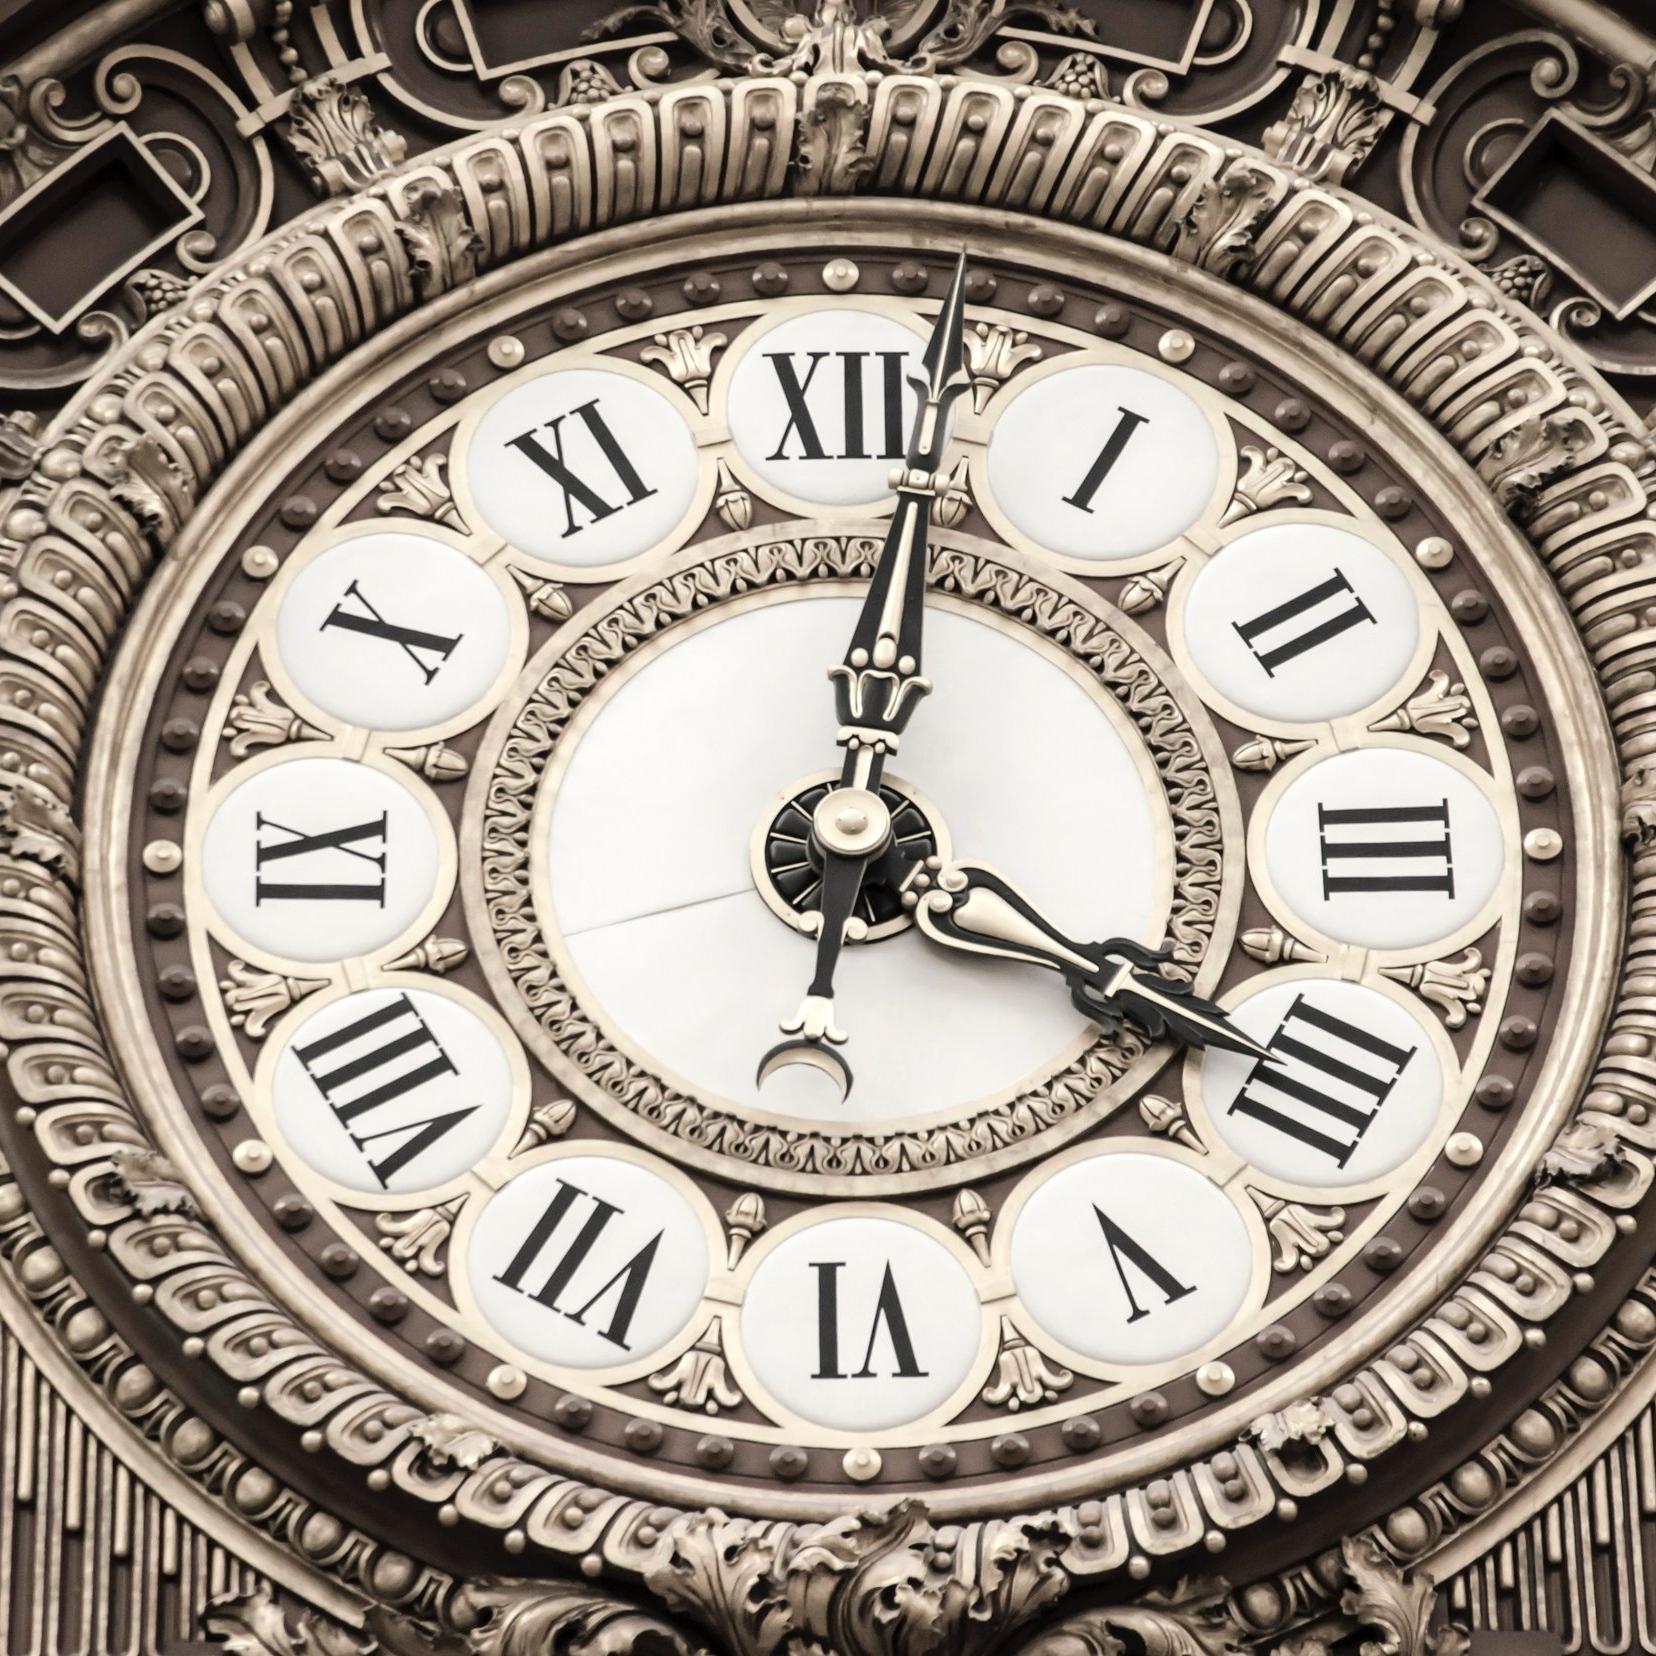 clock-close-up-dial-165770.jpg